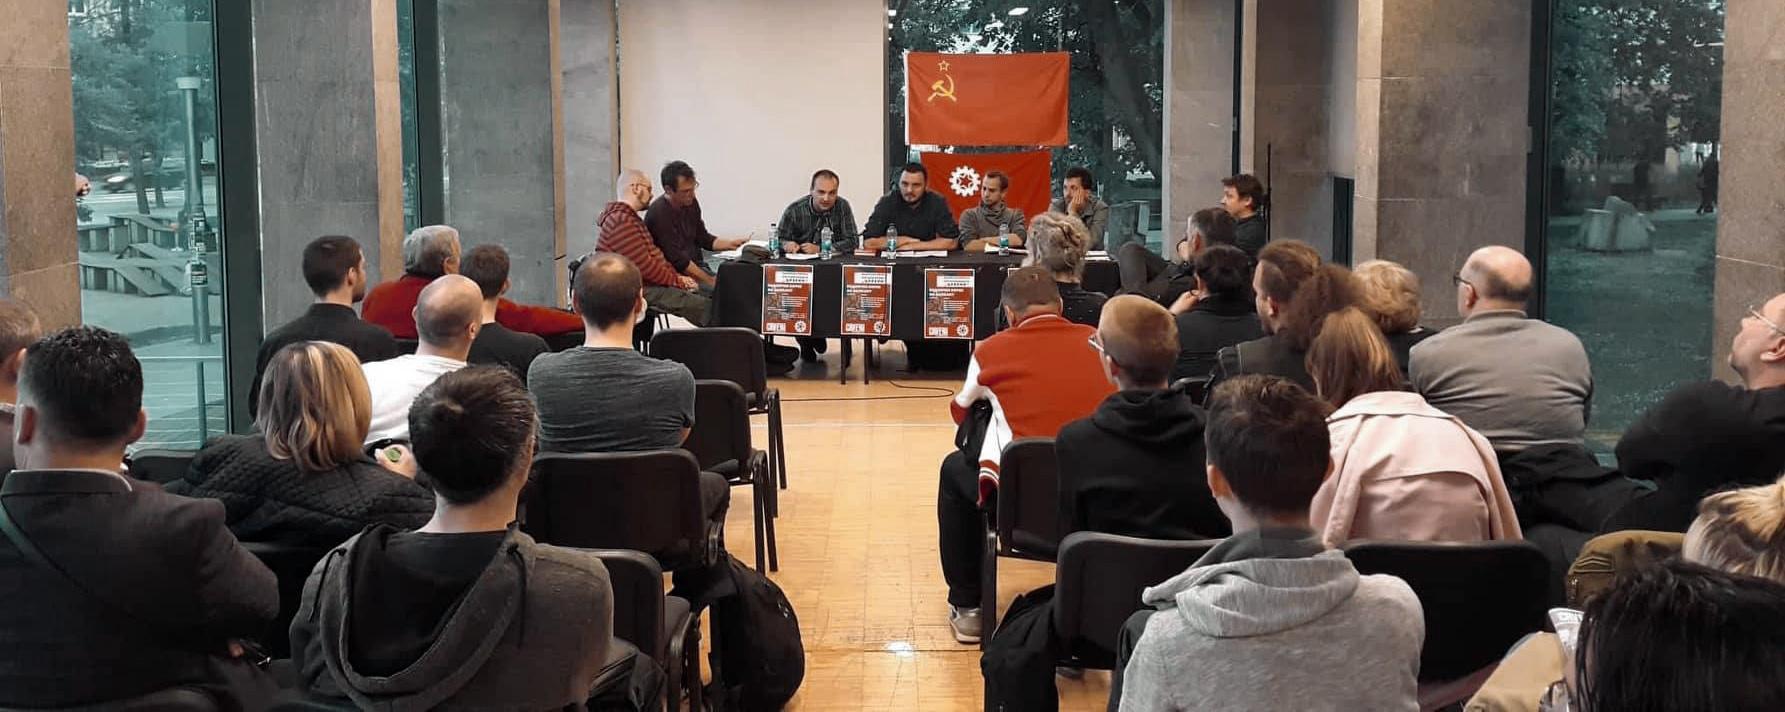 Tribina - Radničke borbe na Balkanu